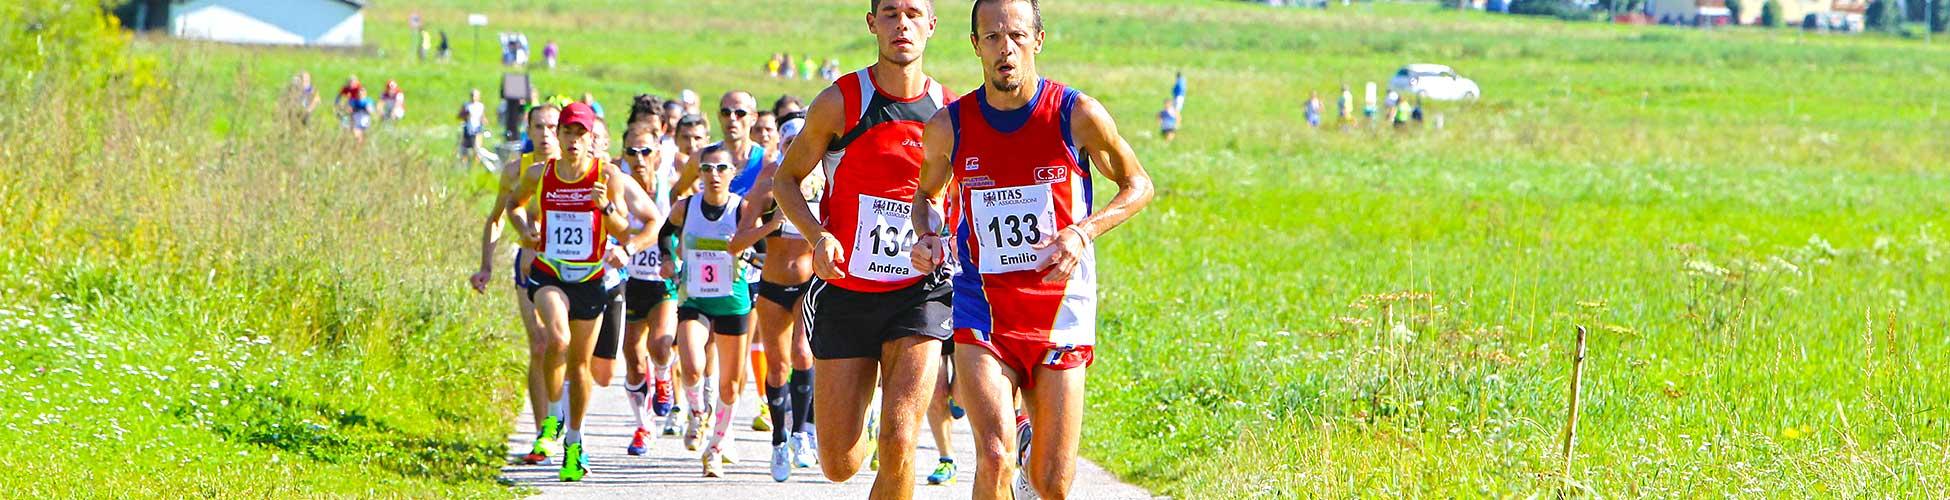 Marcialonga running coop